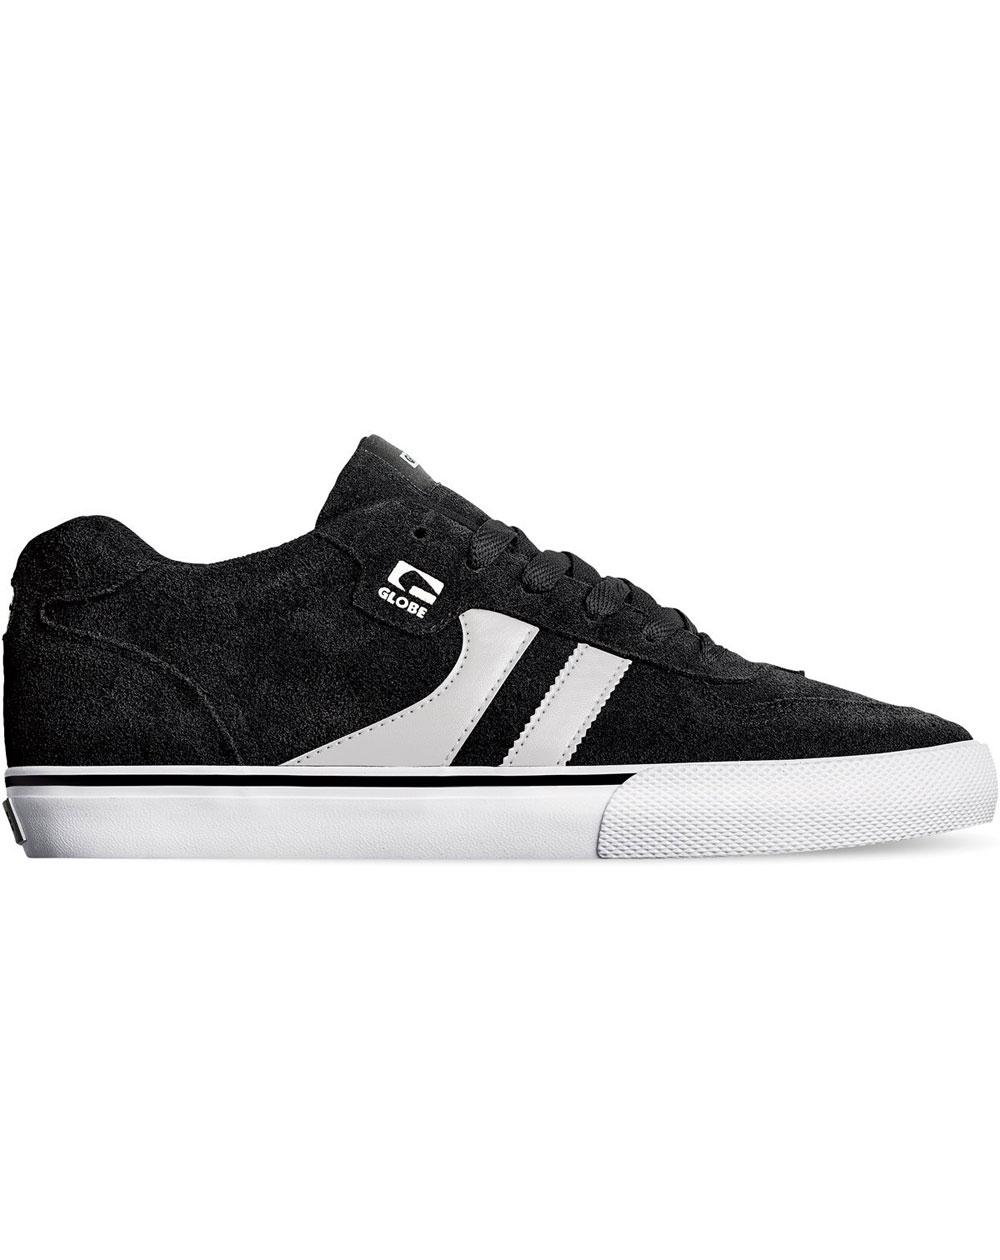 Globe Encore-2 Scarpe Sneakers Uomo Black/Light Grey